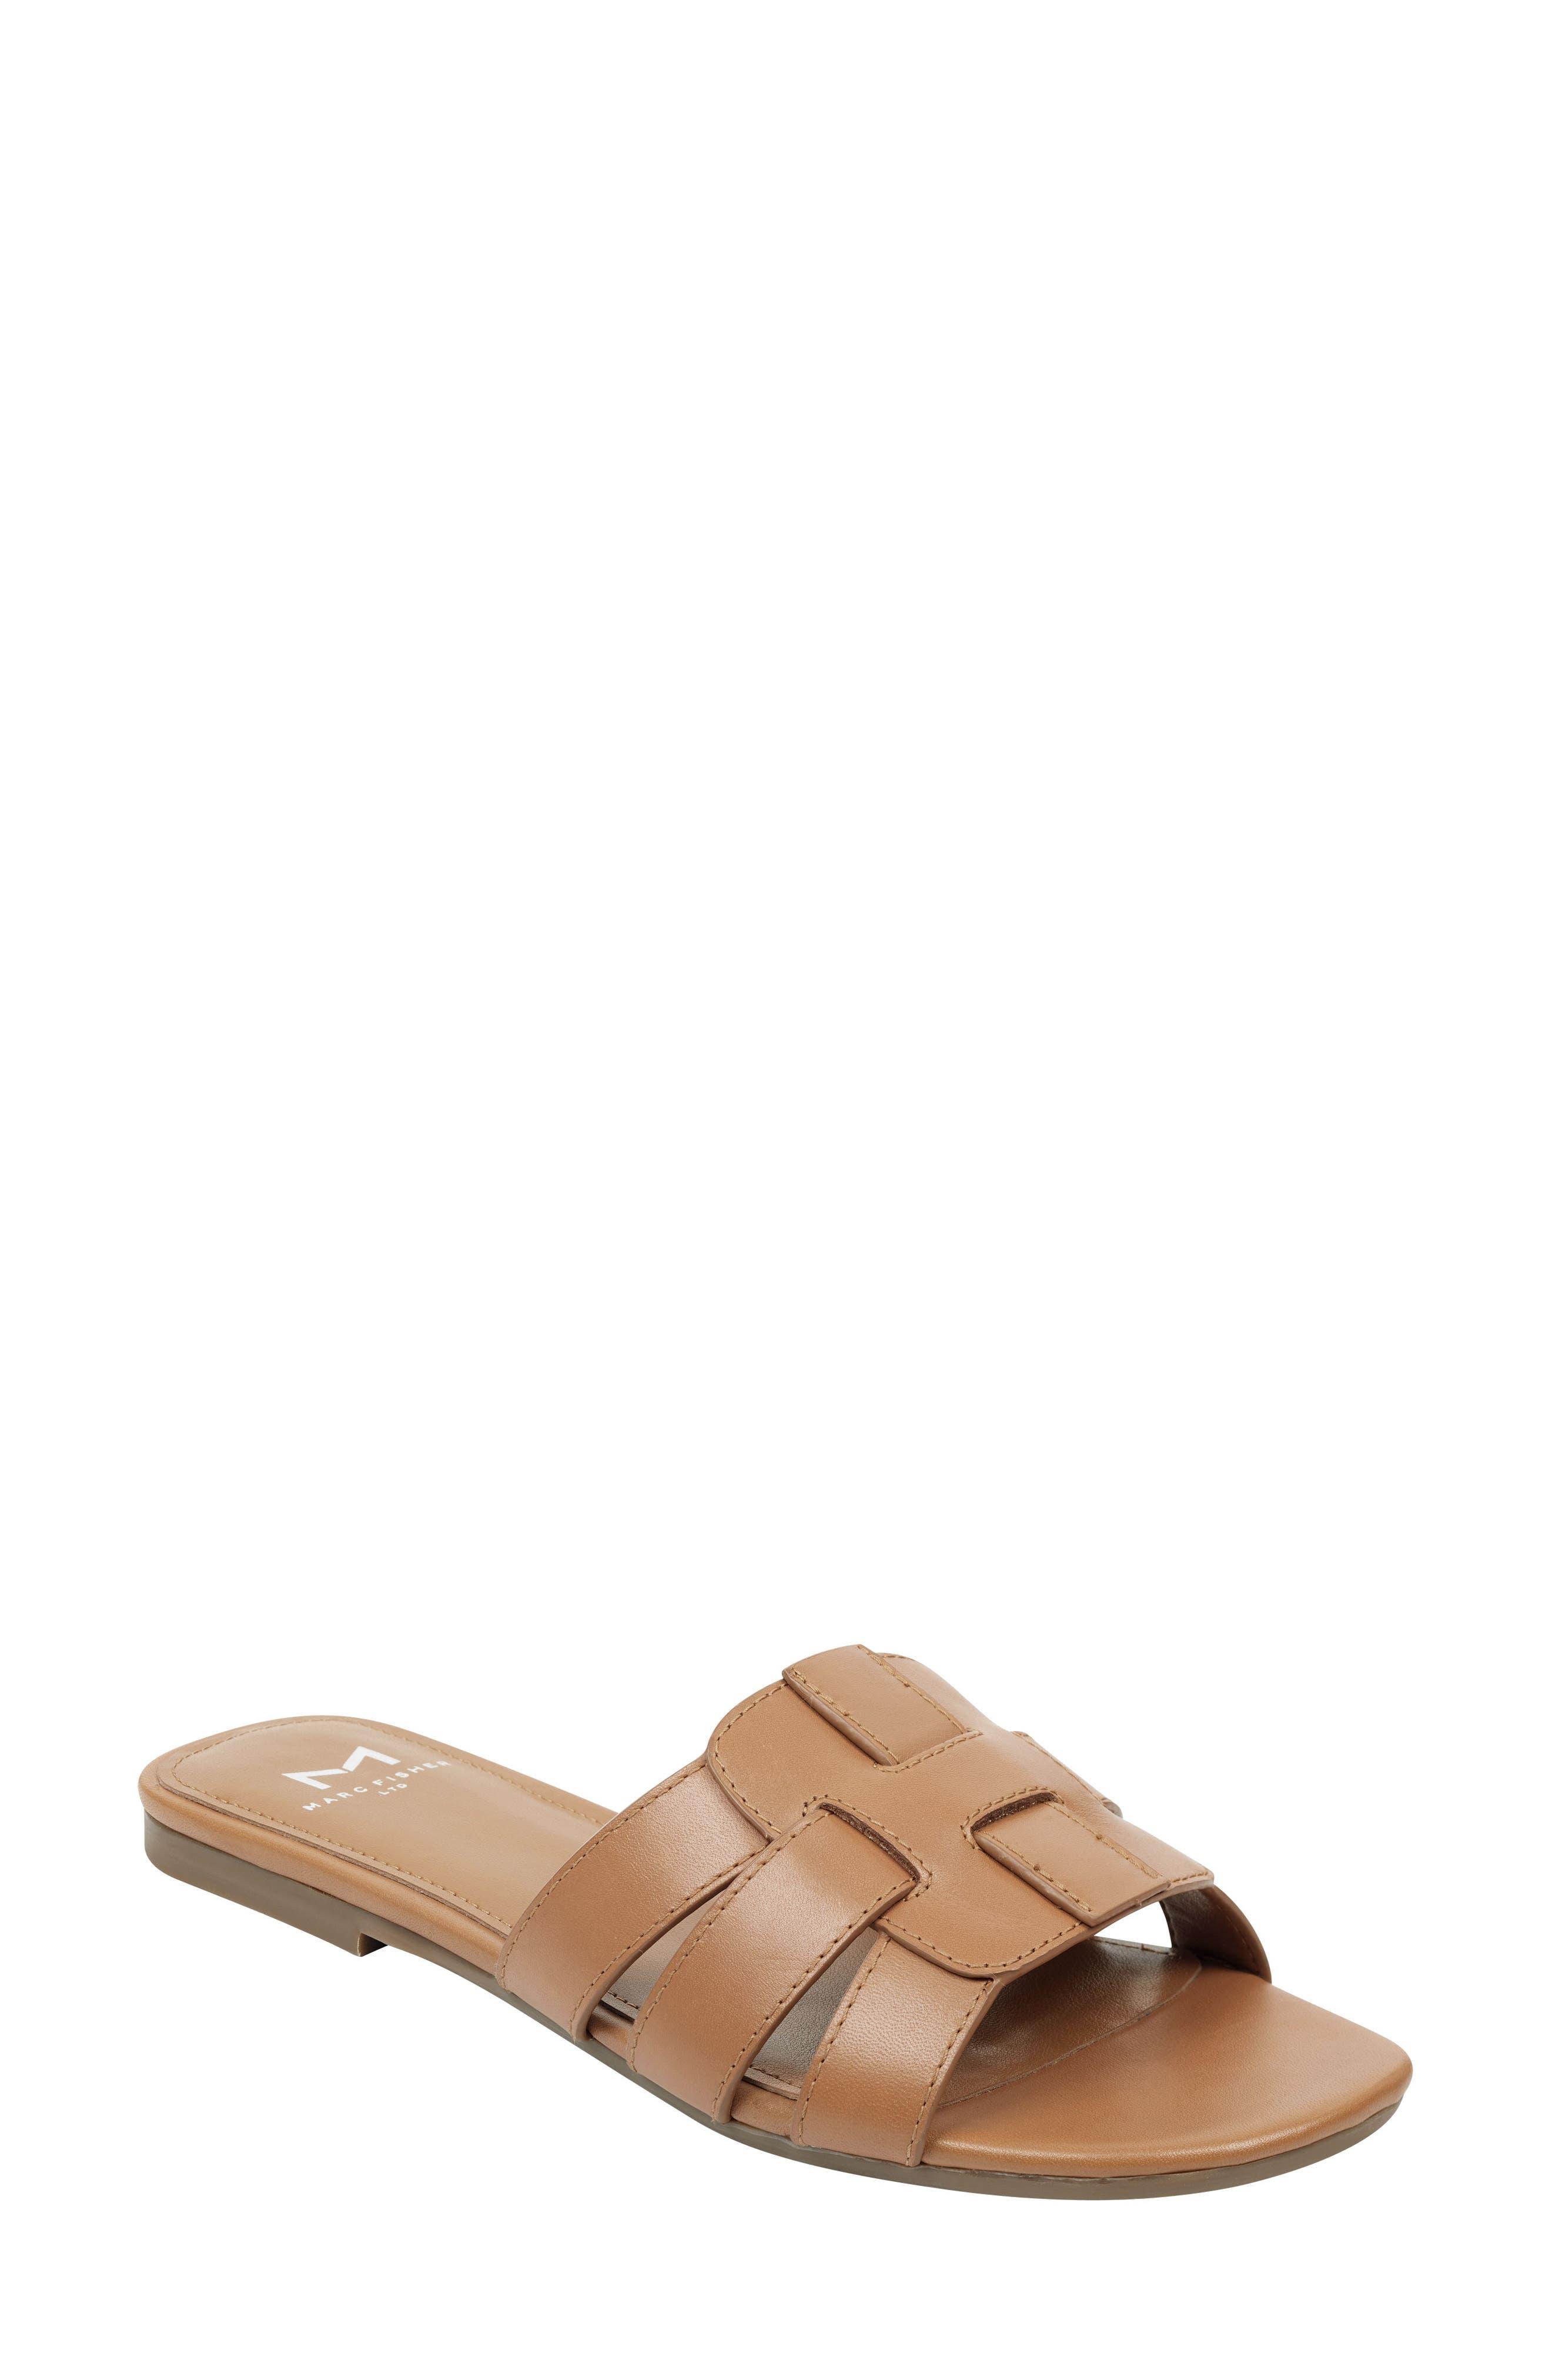 Marc Fisher Ltd Kayli Slide Sandal, Brown